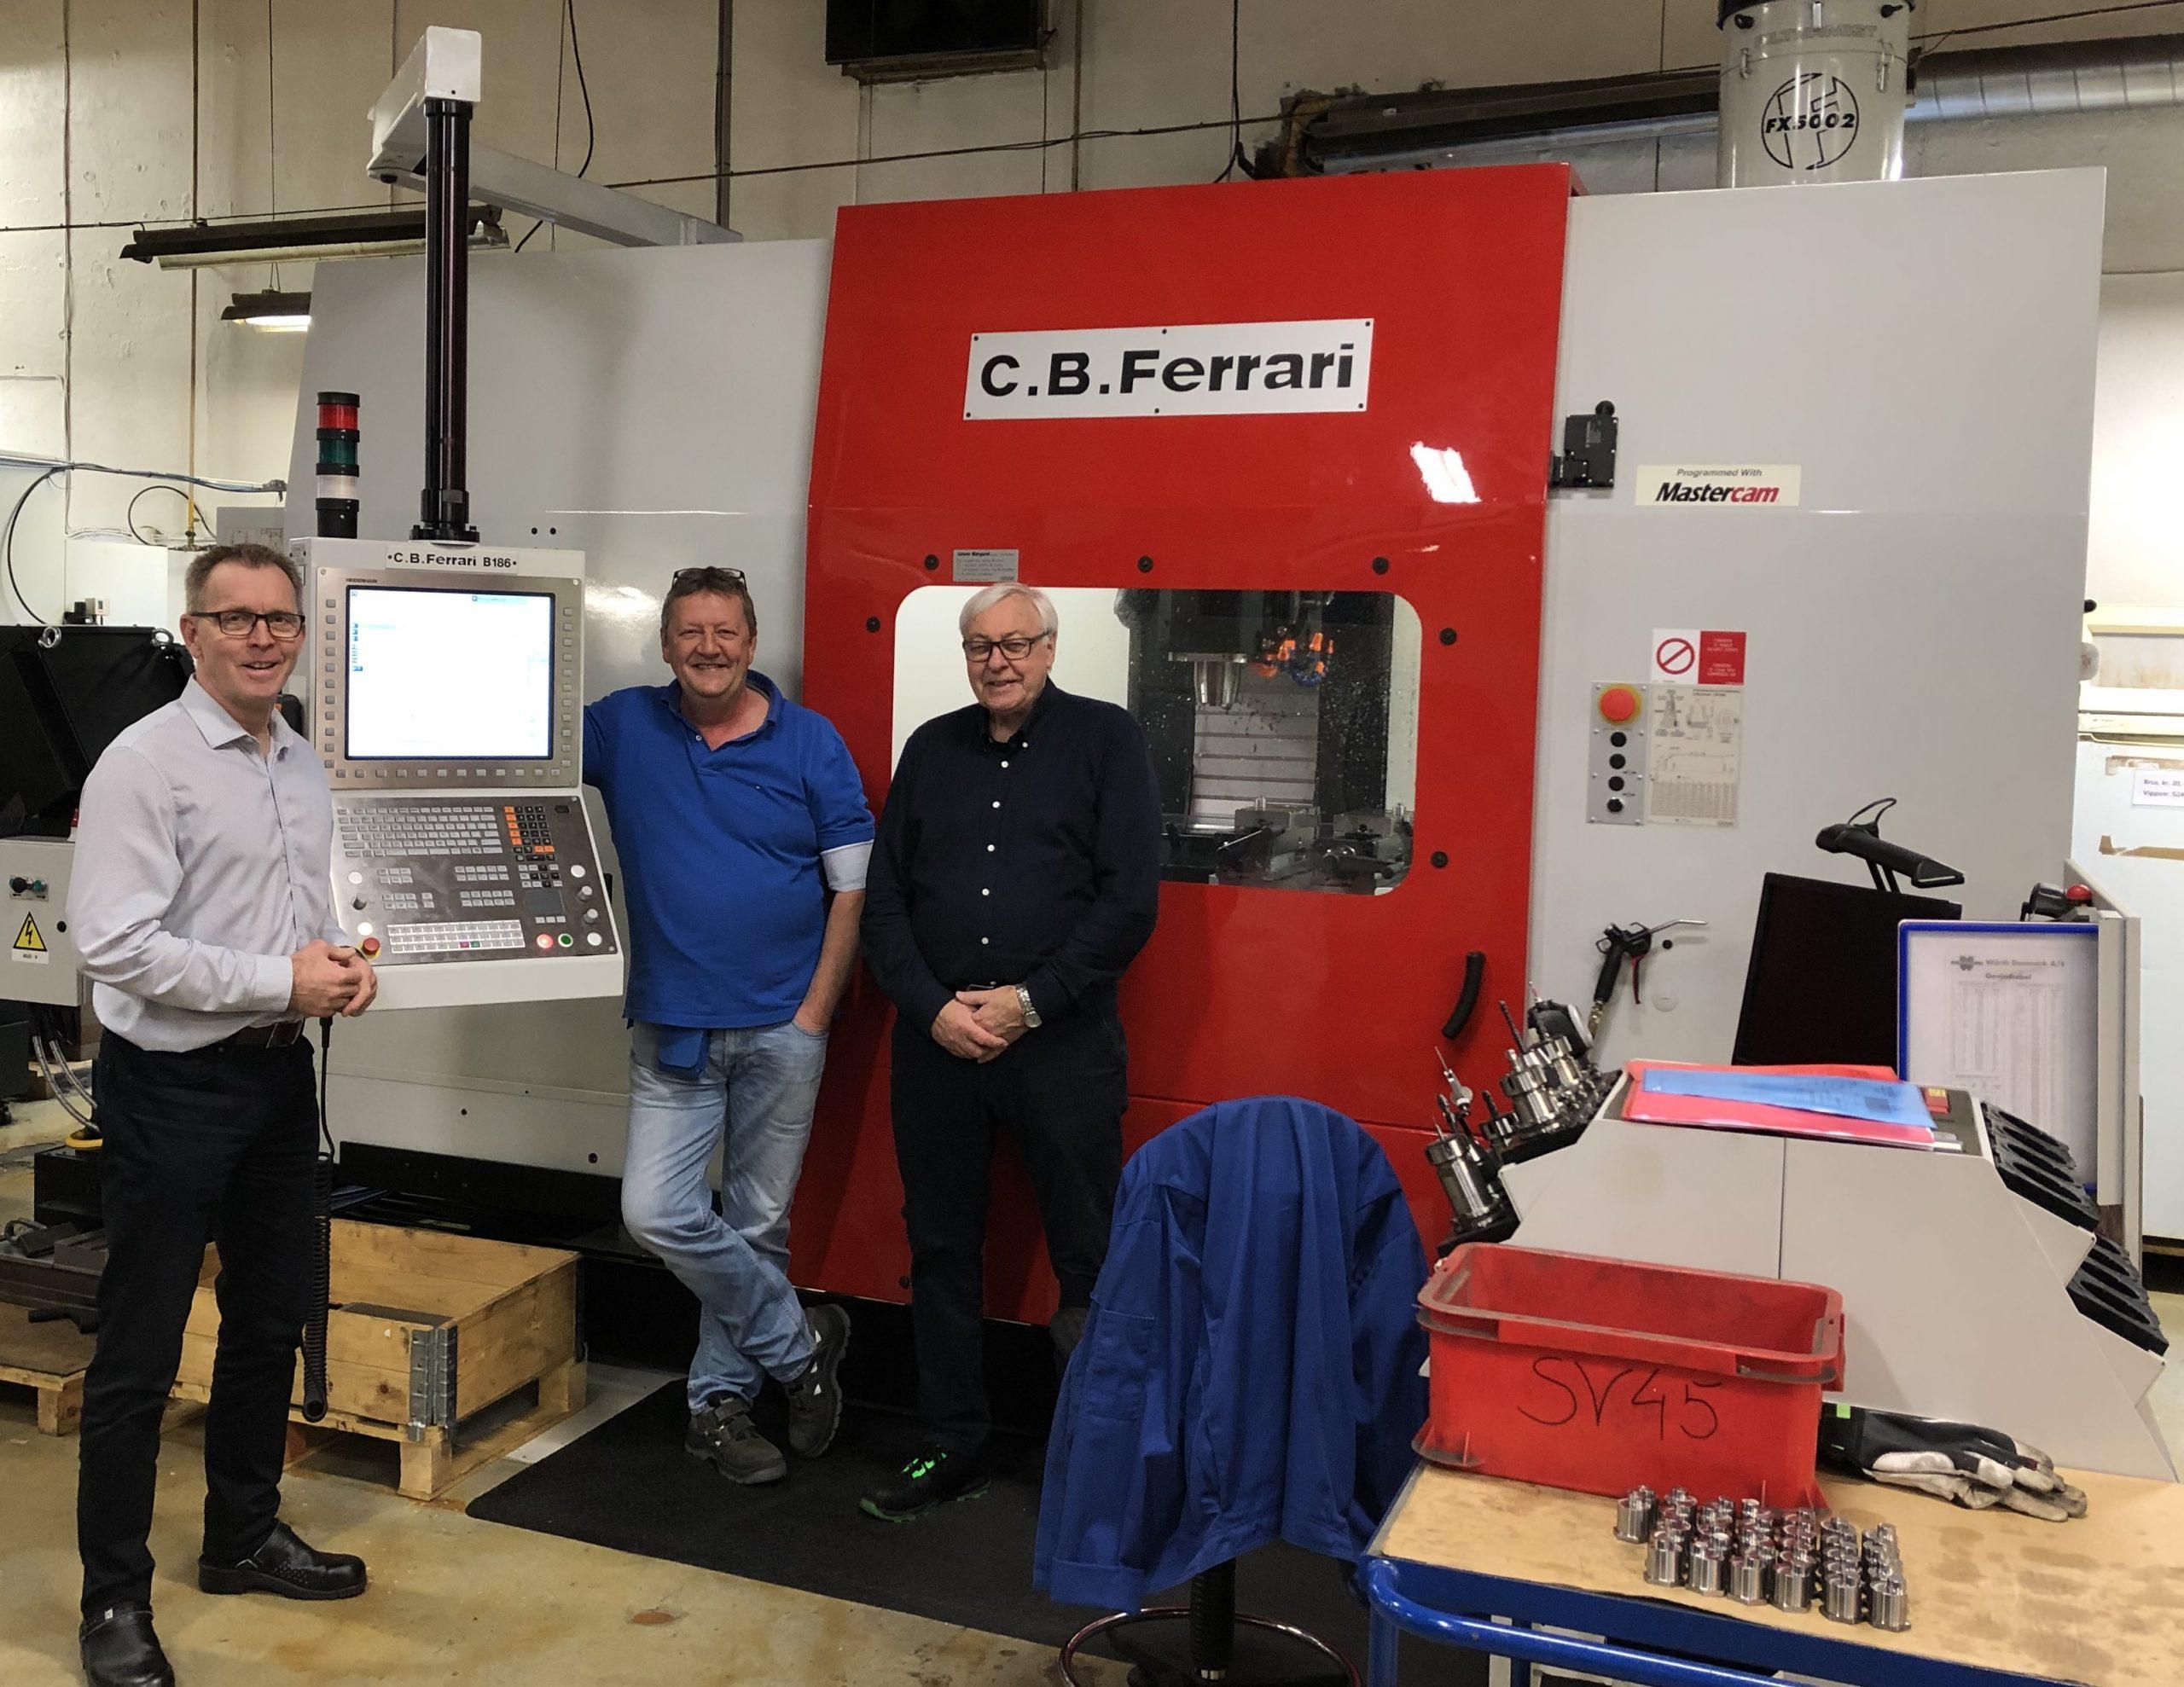 Foran det nye C.B. Ferrari 5-akse maskineringssenteret, f.v.: Knut Mjåland, Managing Director, Kjell-Gunnar Noddeland, Operations Manager Looms & Spares, begge fra Fenner Mandals og direktør Bjørn P. Svennungsen fra ABC-Maskin AS